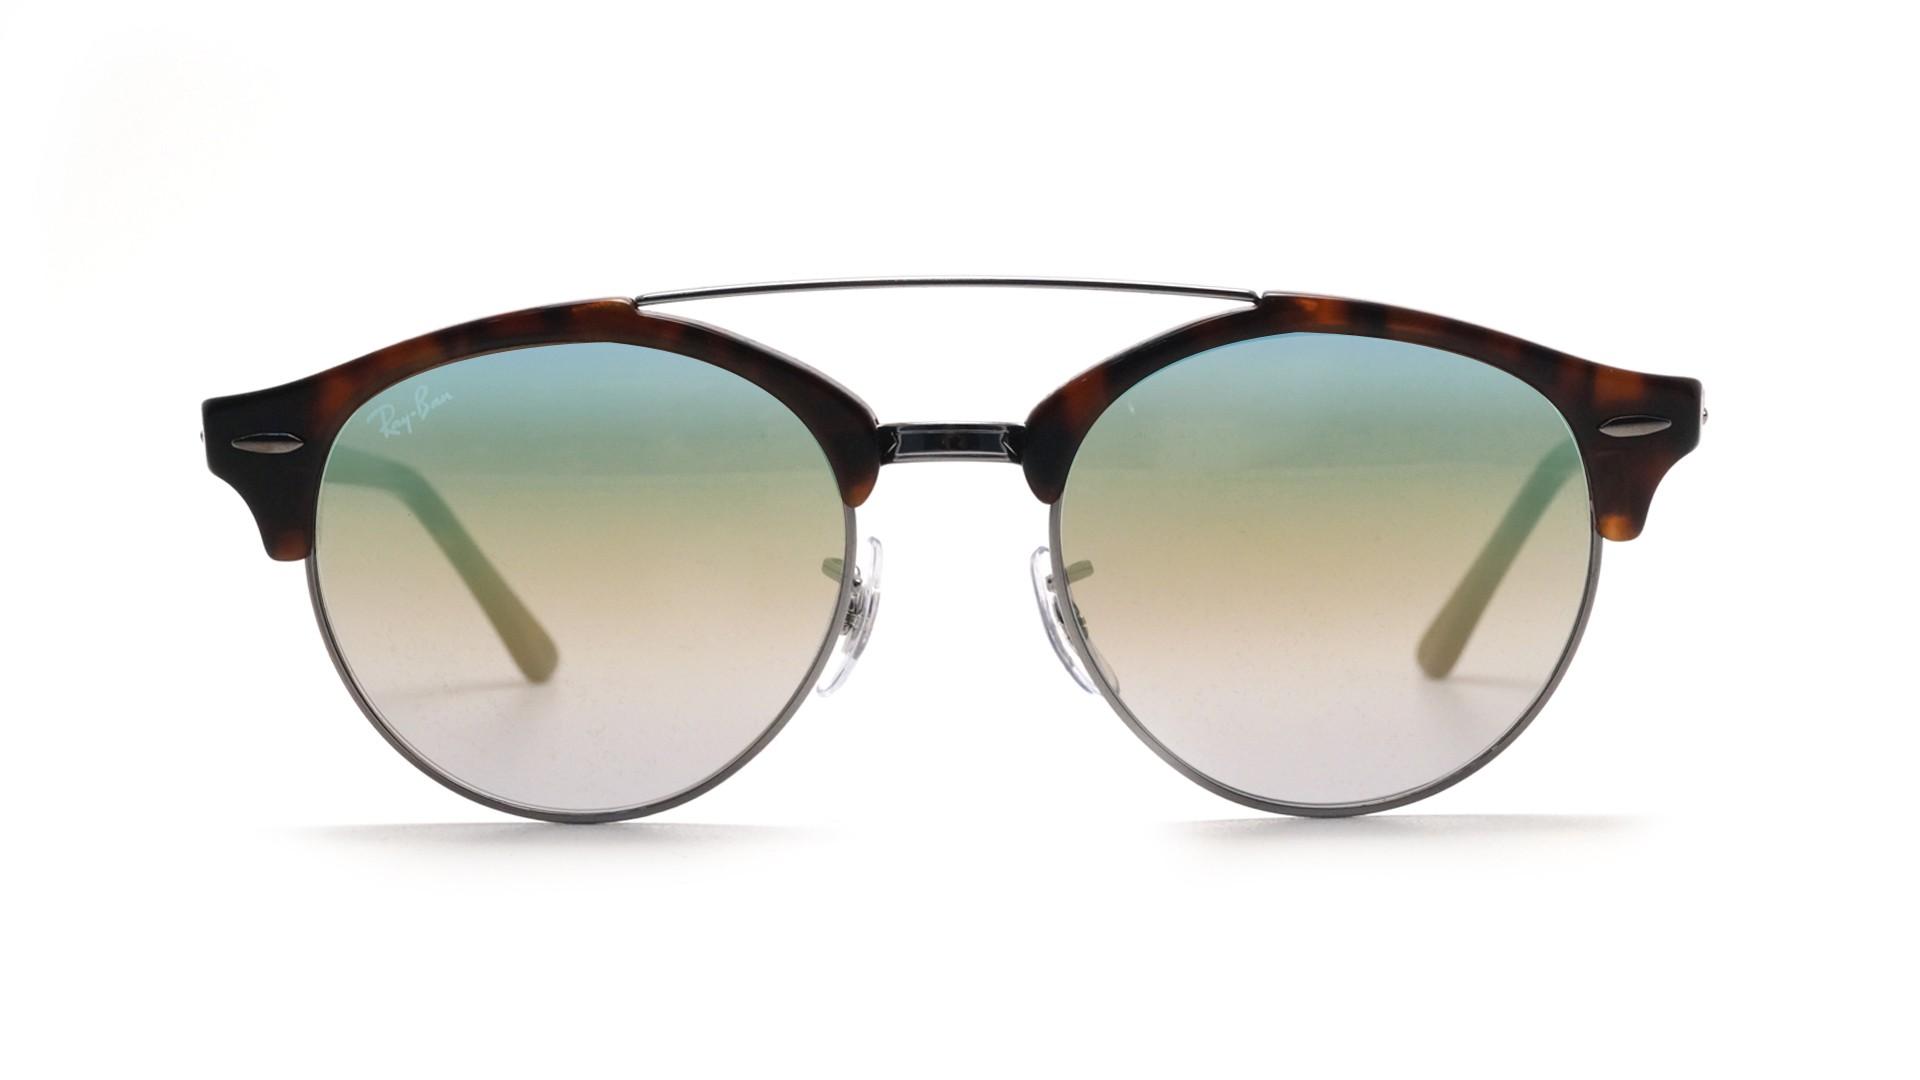 ray ban clubmaster double bridge sunglassessale. Black Bedroom Furniture Sets. Home Design Ideas